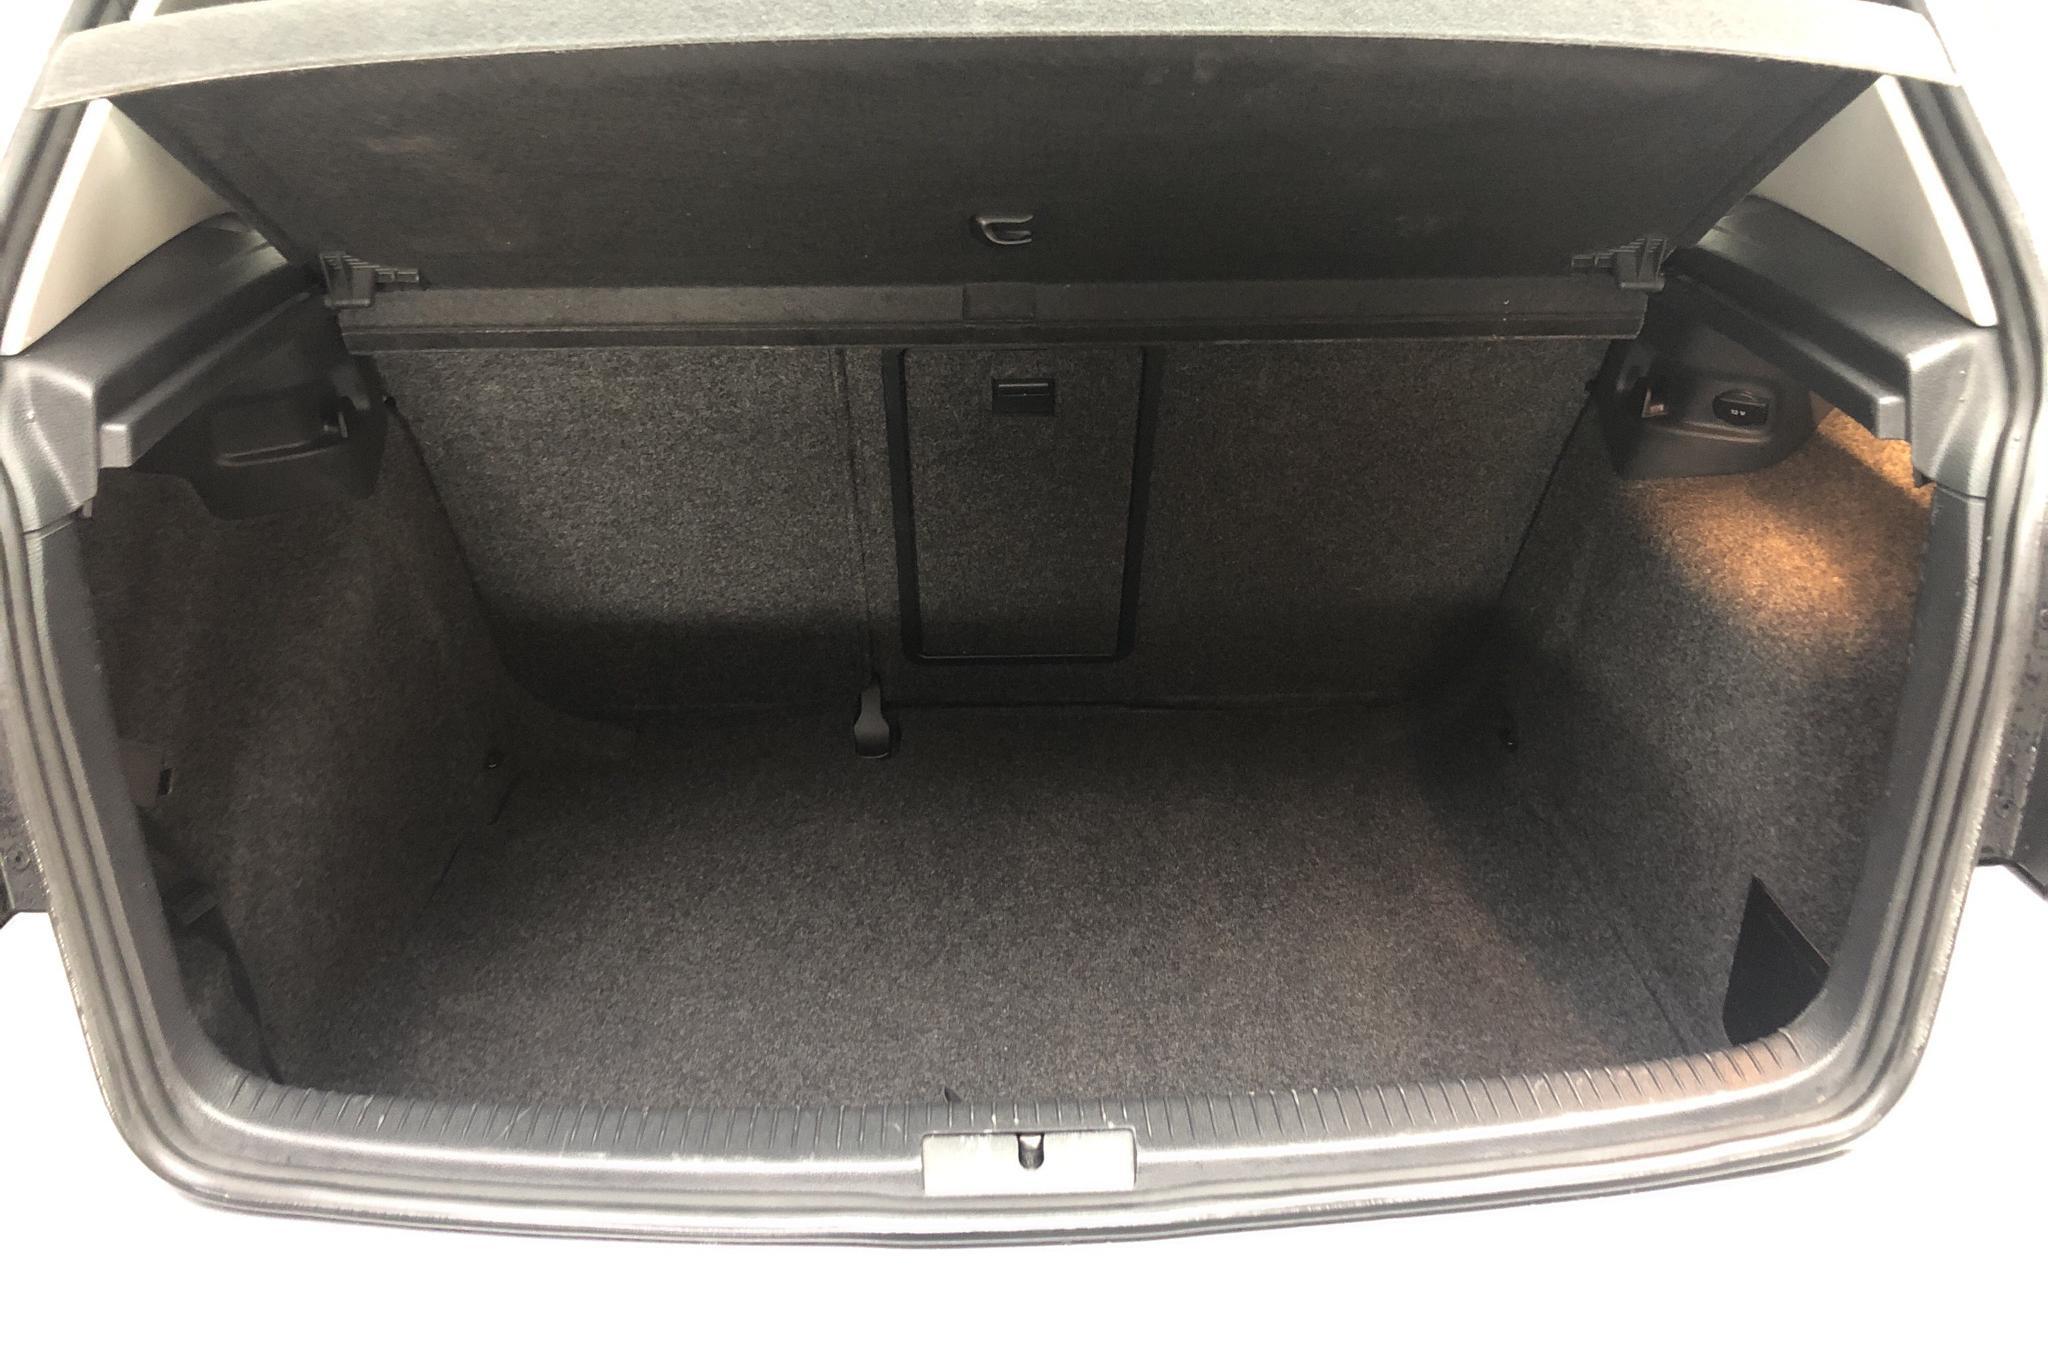 VW Golf VI 1.6 TDI BlueMotion Technology 5dr (105hk) - 14 059 mil - Manuell - silver - 2013